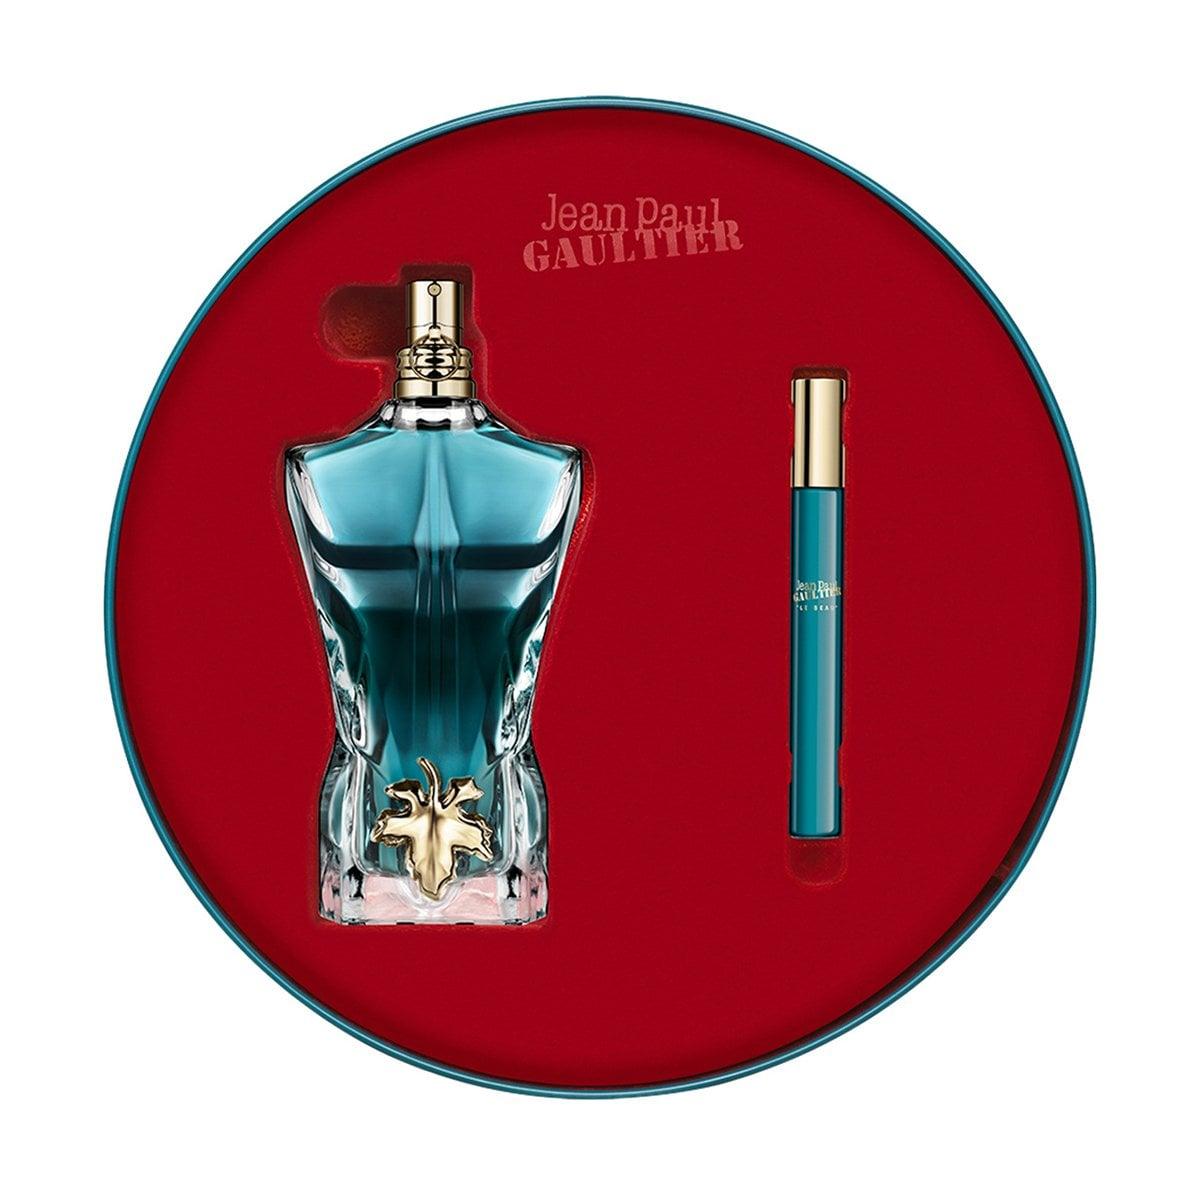 Estuche para Caballero Jean Paul Gaultier Le Beau Edt 125 Ml + Travel Spray 10 Ml